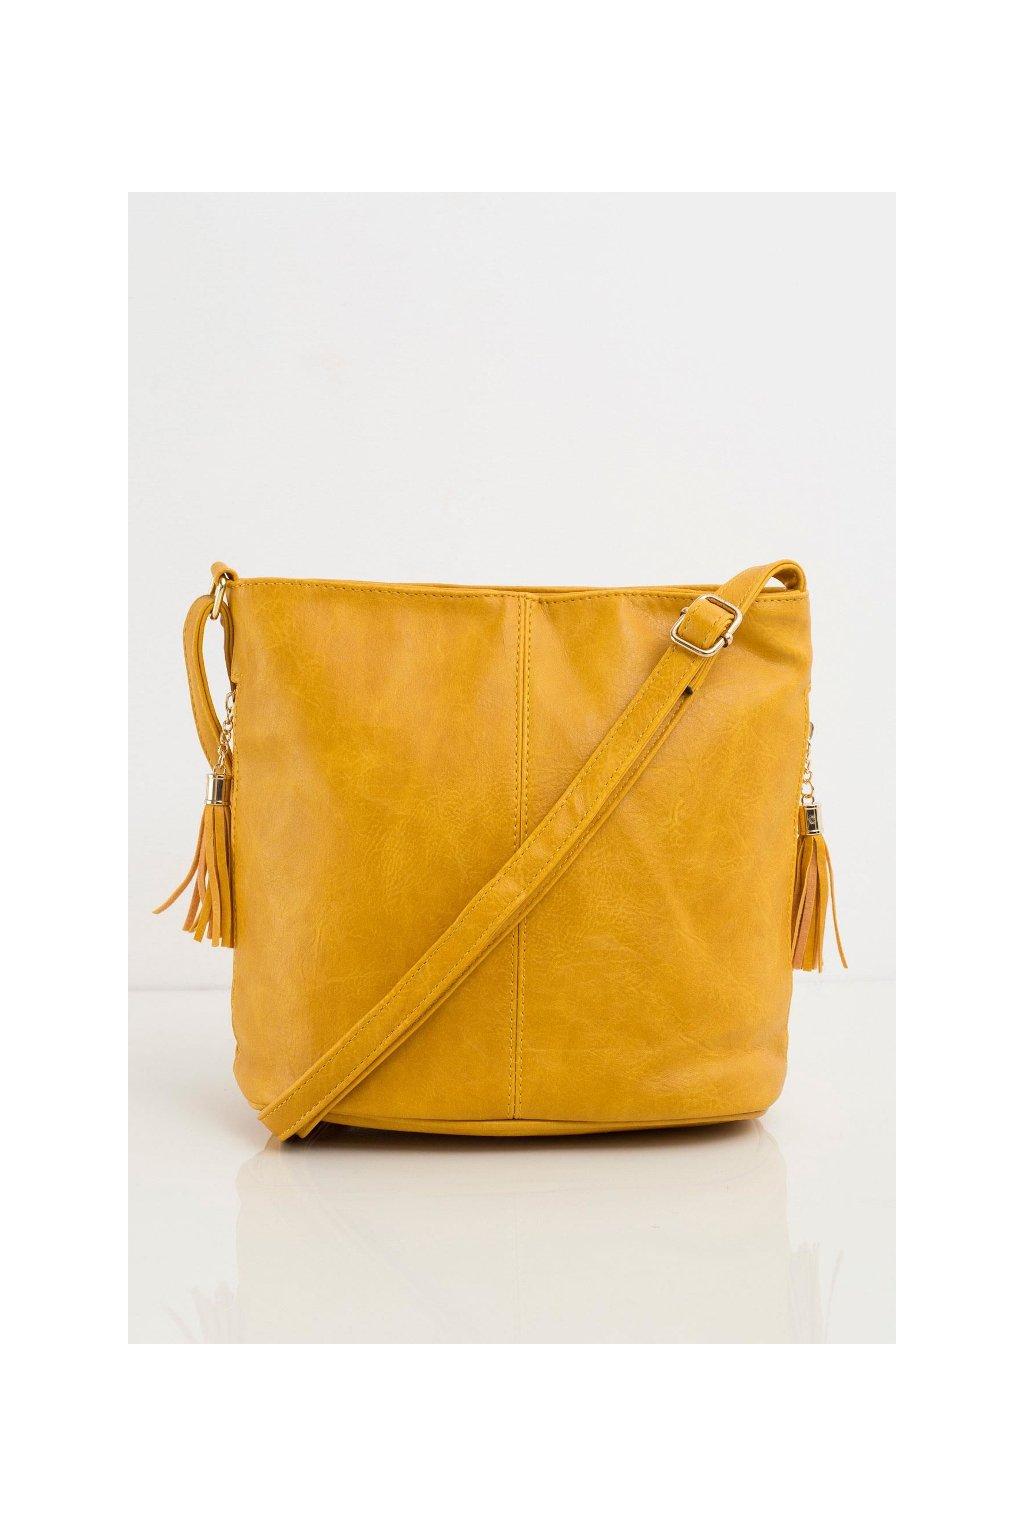 Velká žlutá crossbody kabelka